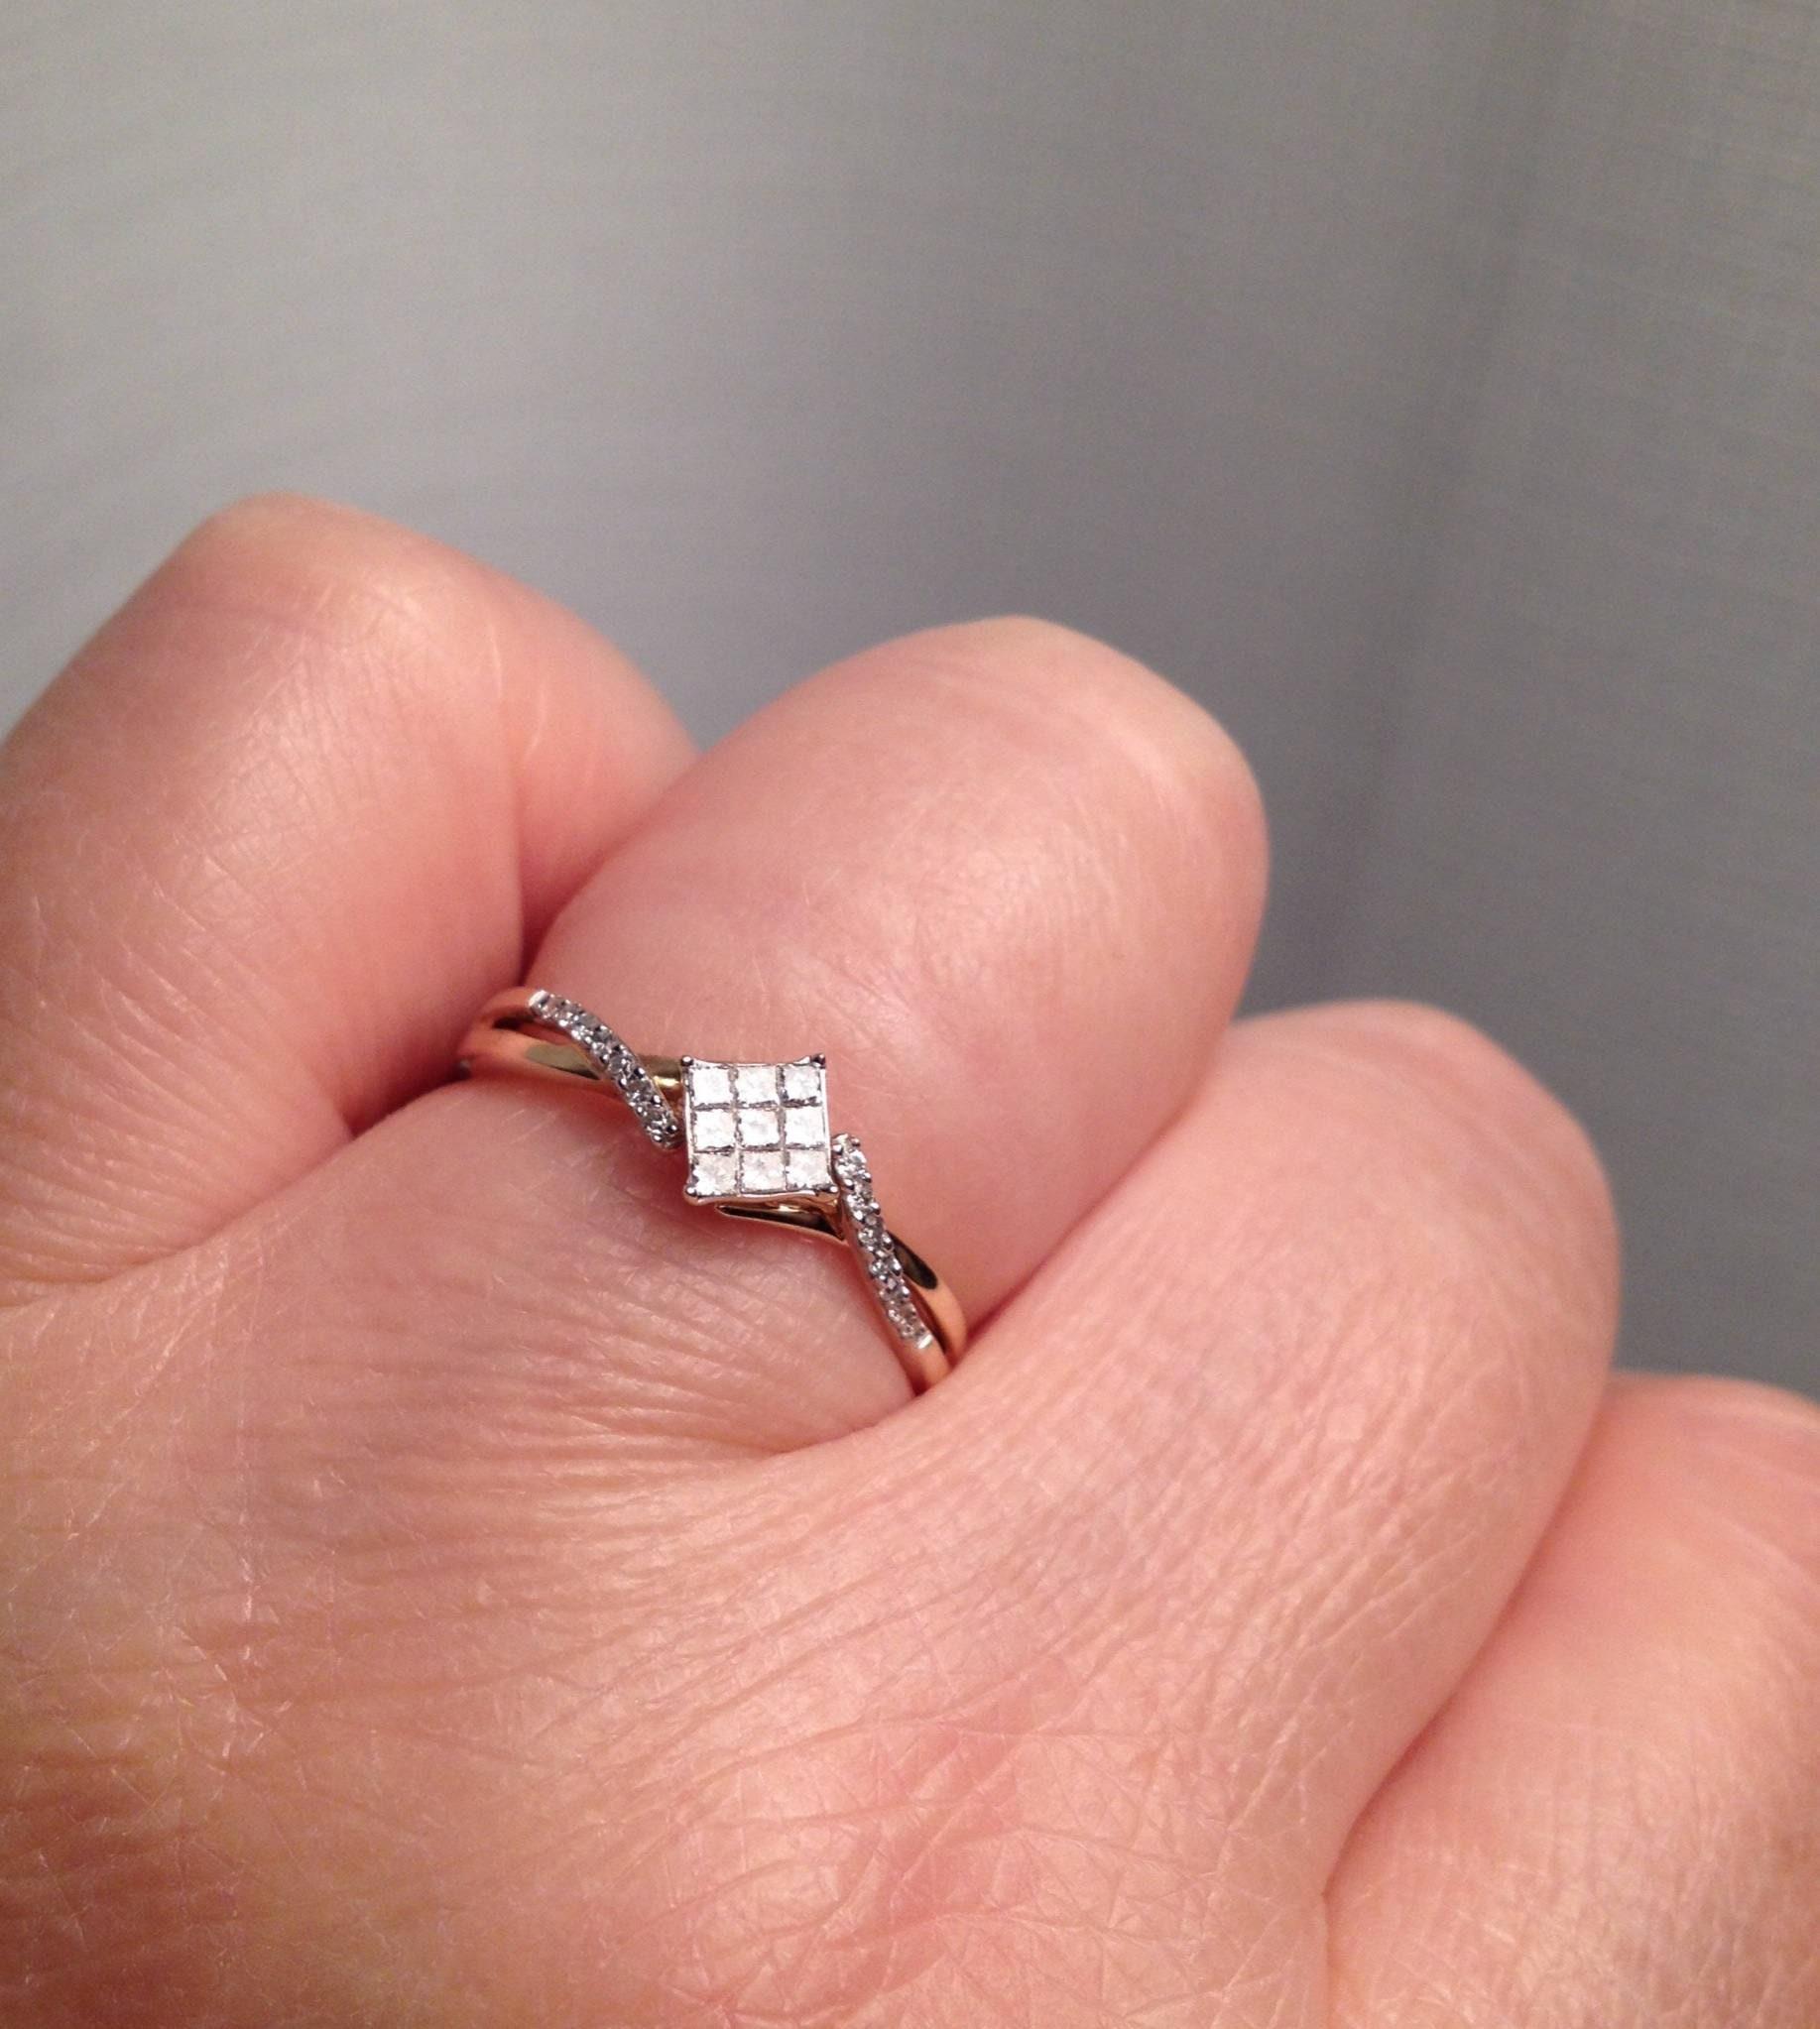 Sale Size 7 Diamond Ring 10K Yellow Gold Engagement Ring   Etsy